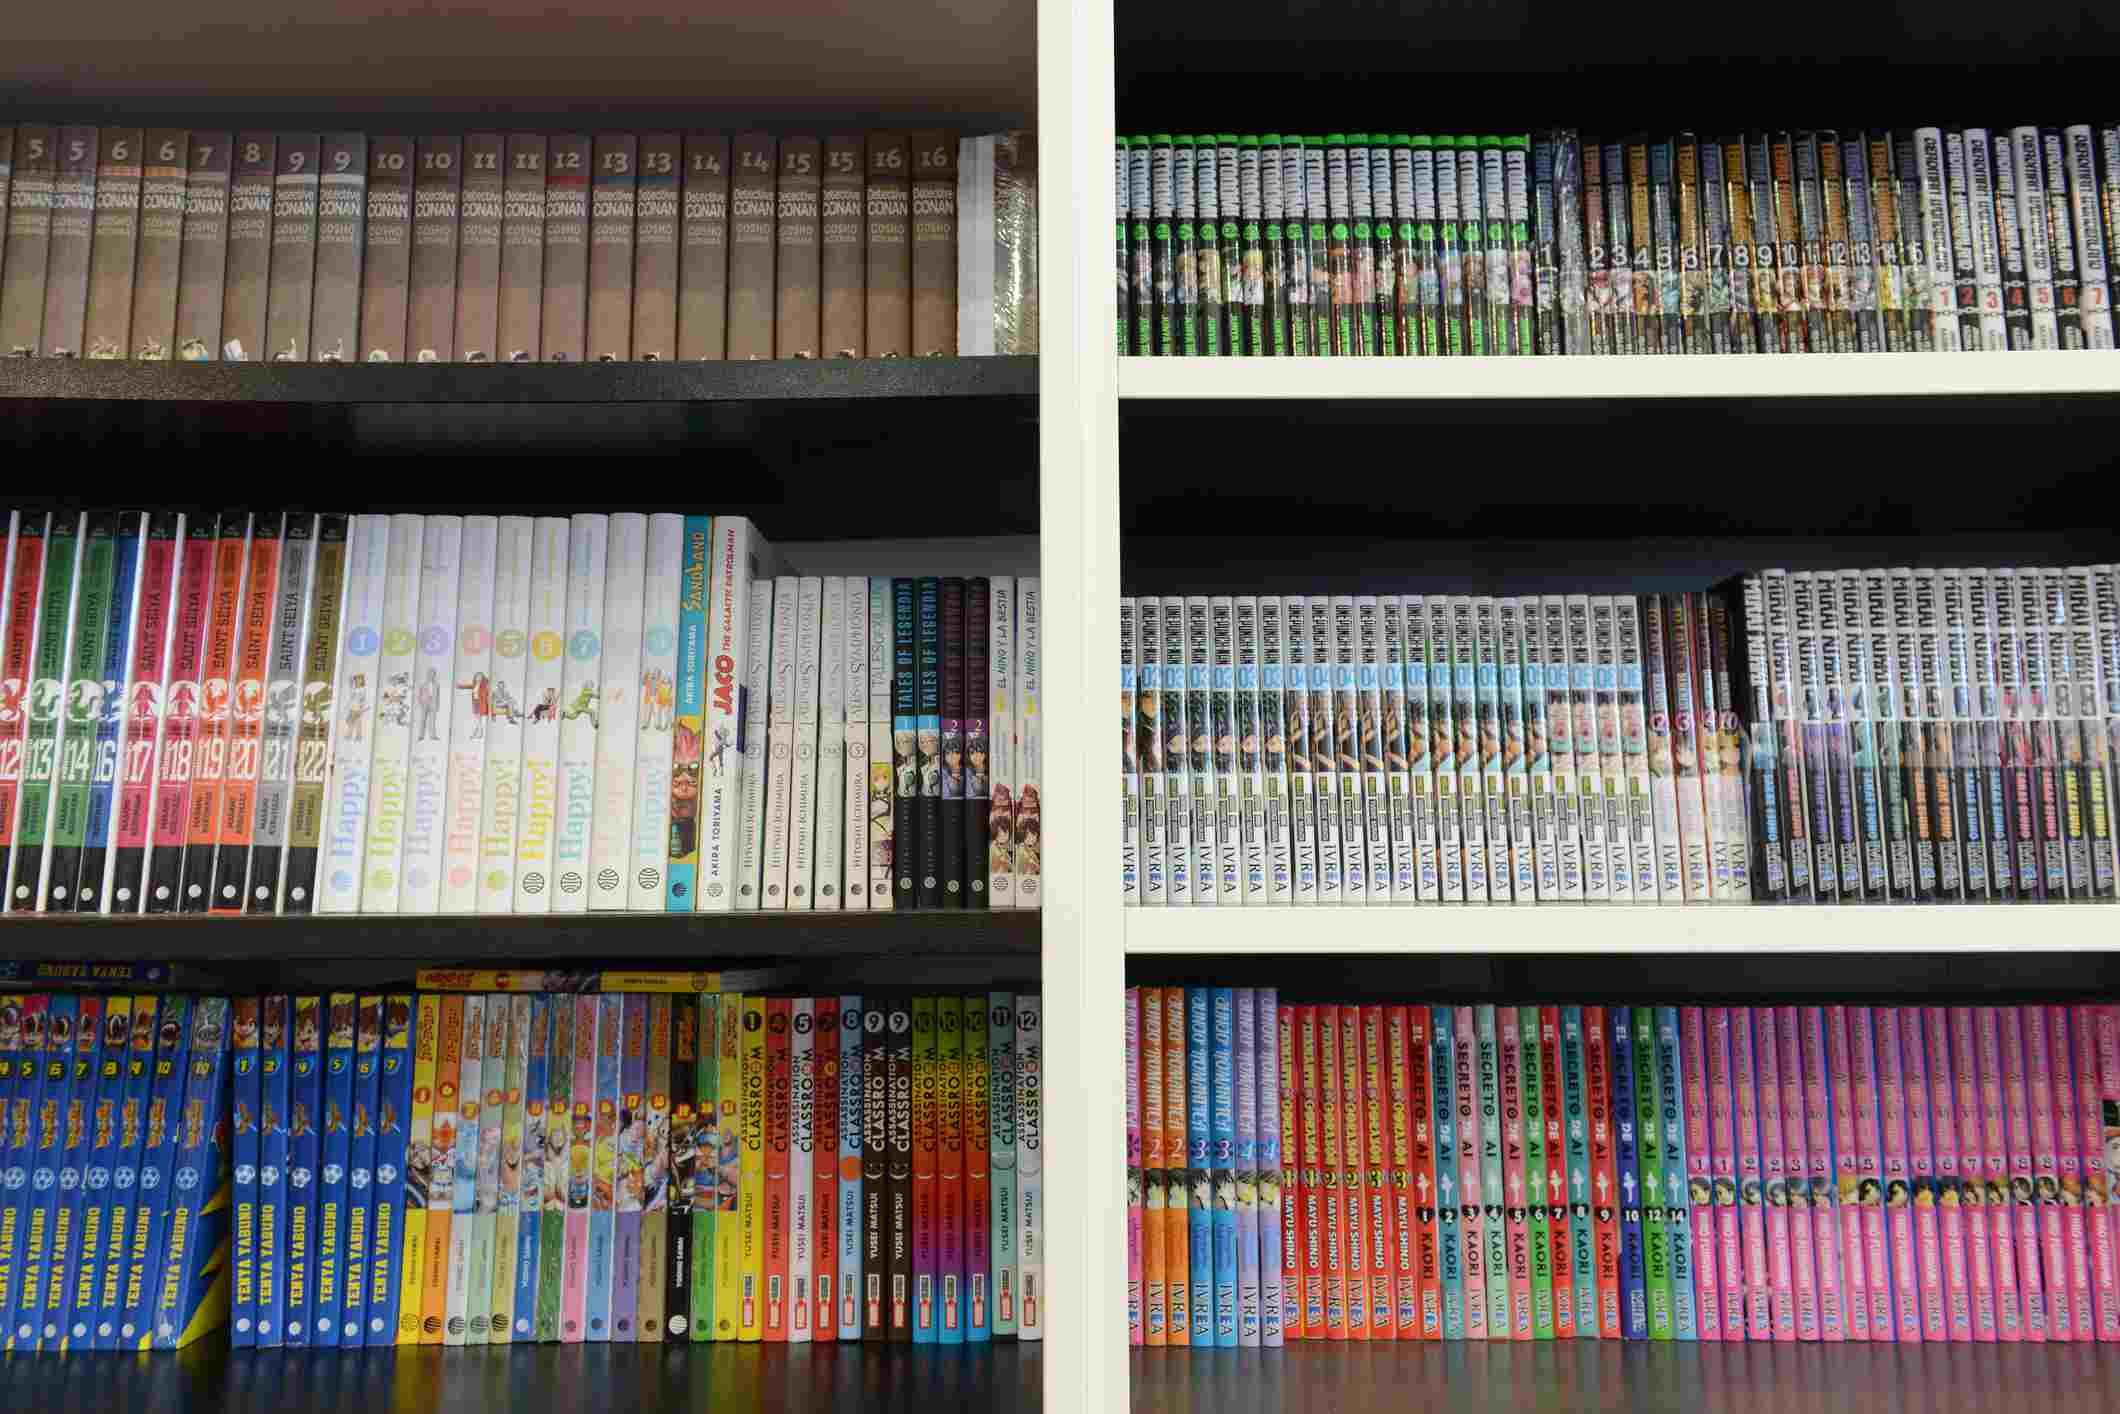 shelves of manga